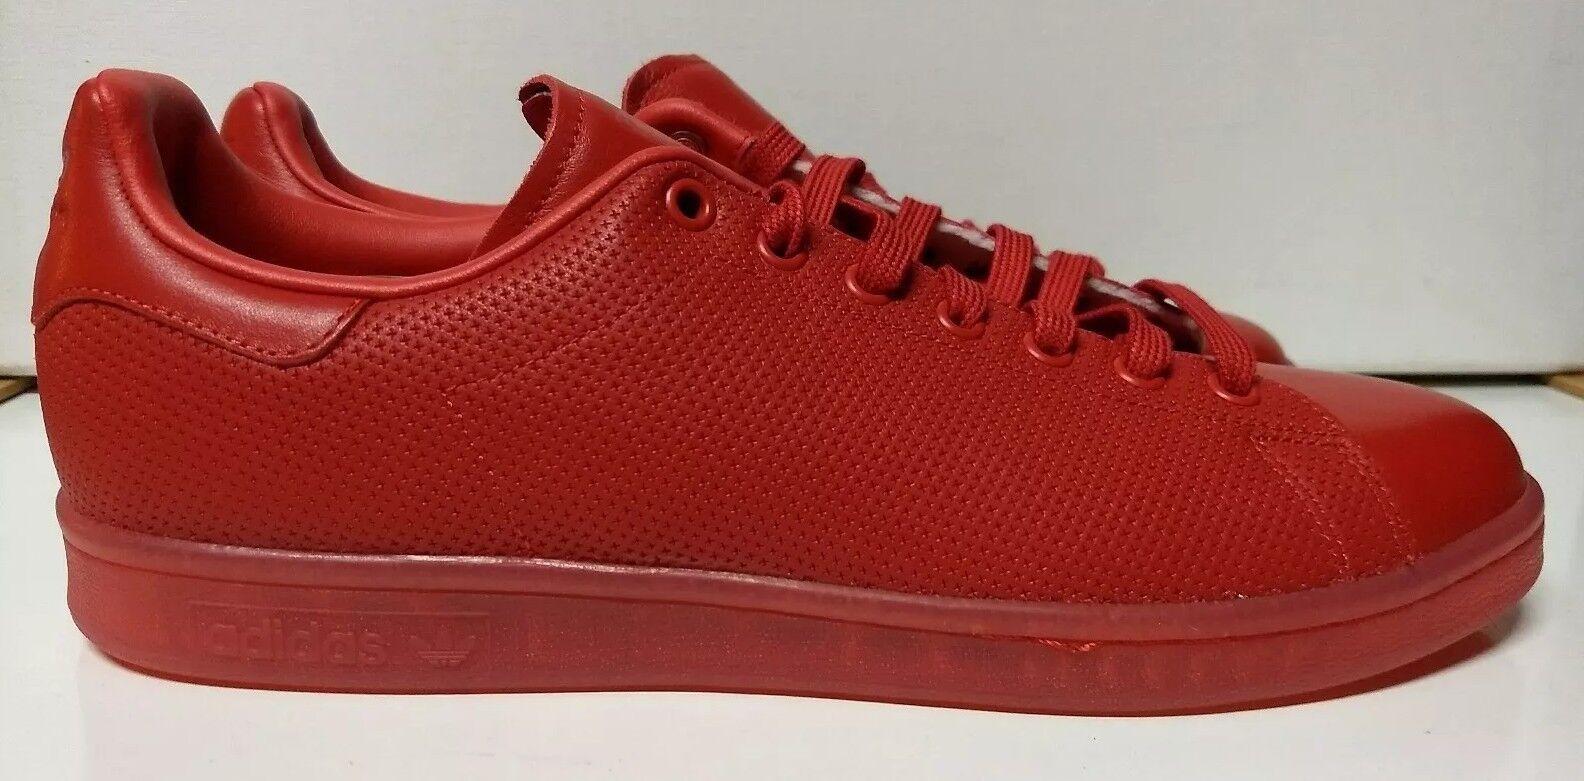 Adidas smith stan smith Adidas numero 13 rosso adicolor Uomo scarpe scarpa s80248 1ed4cf